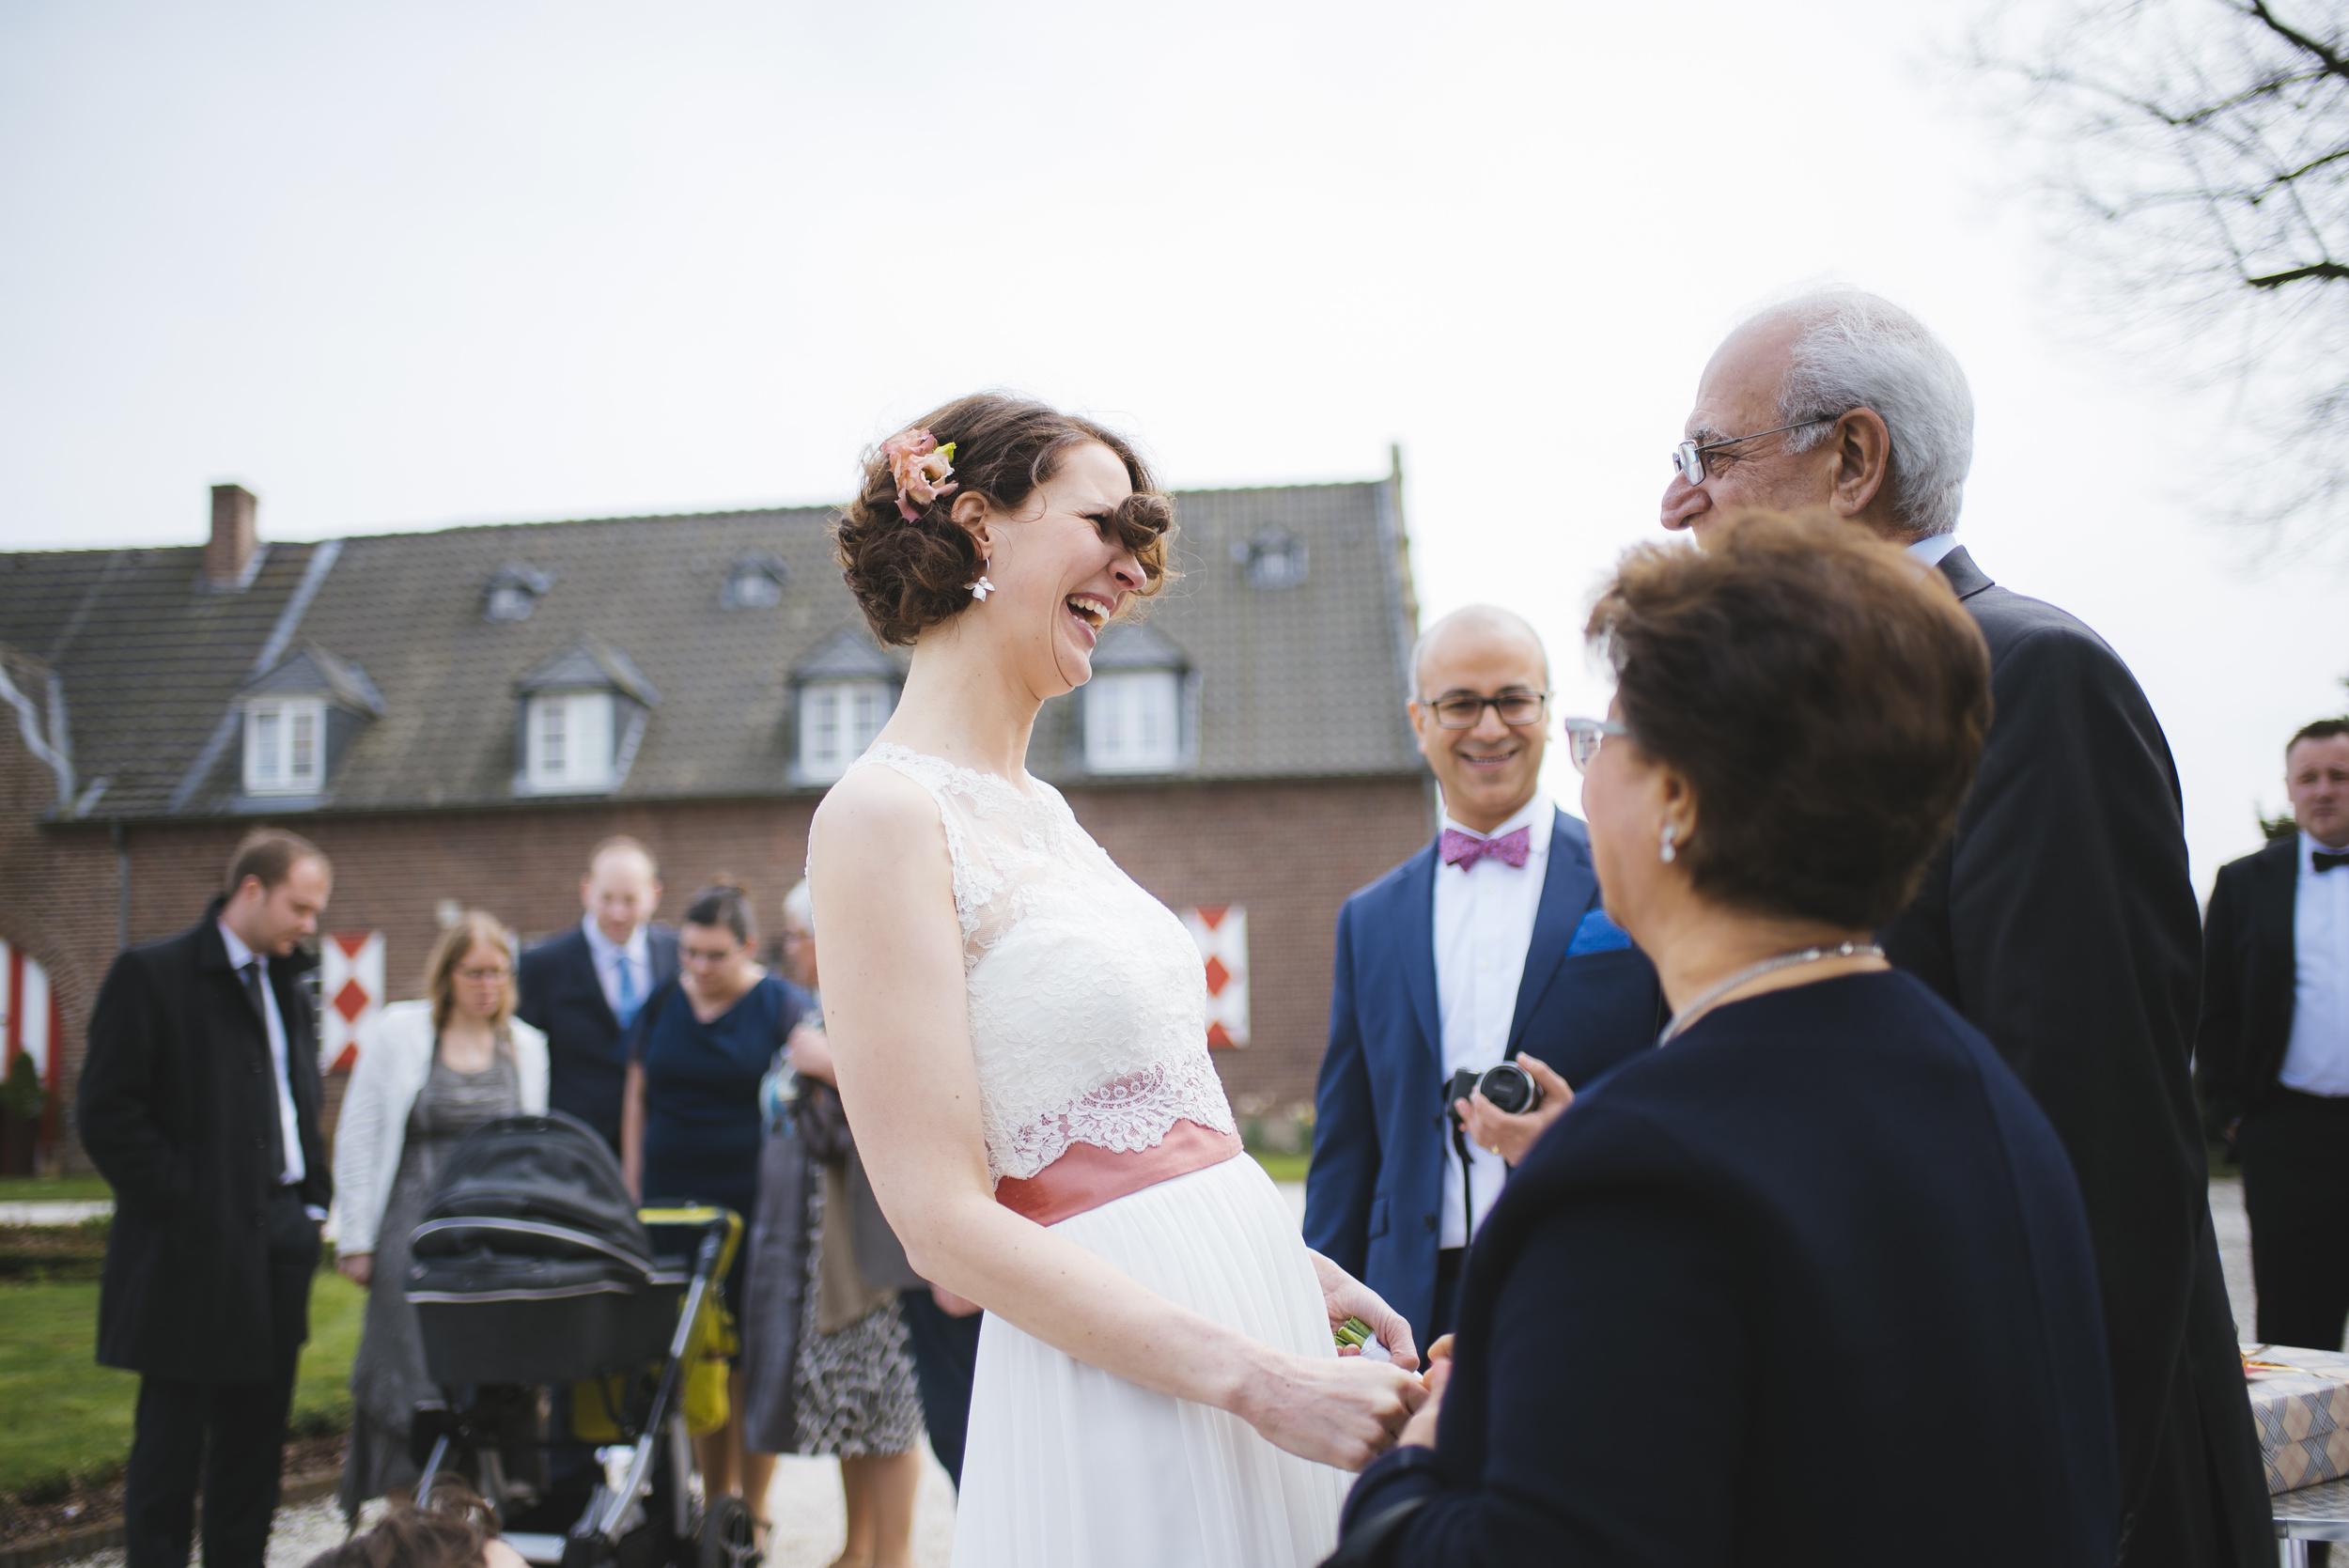 Hochzeitsfotograf-Schlossruine-Hertefeld-Weeze-055.jpg